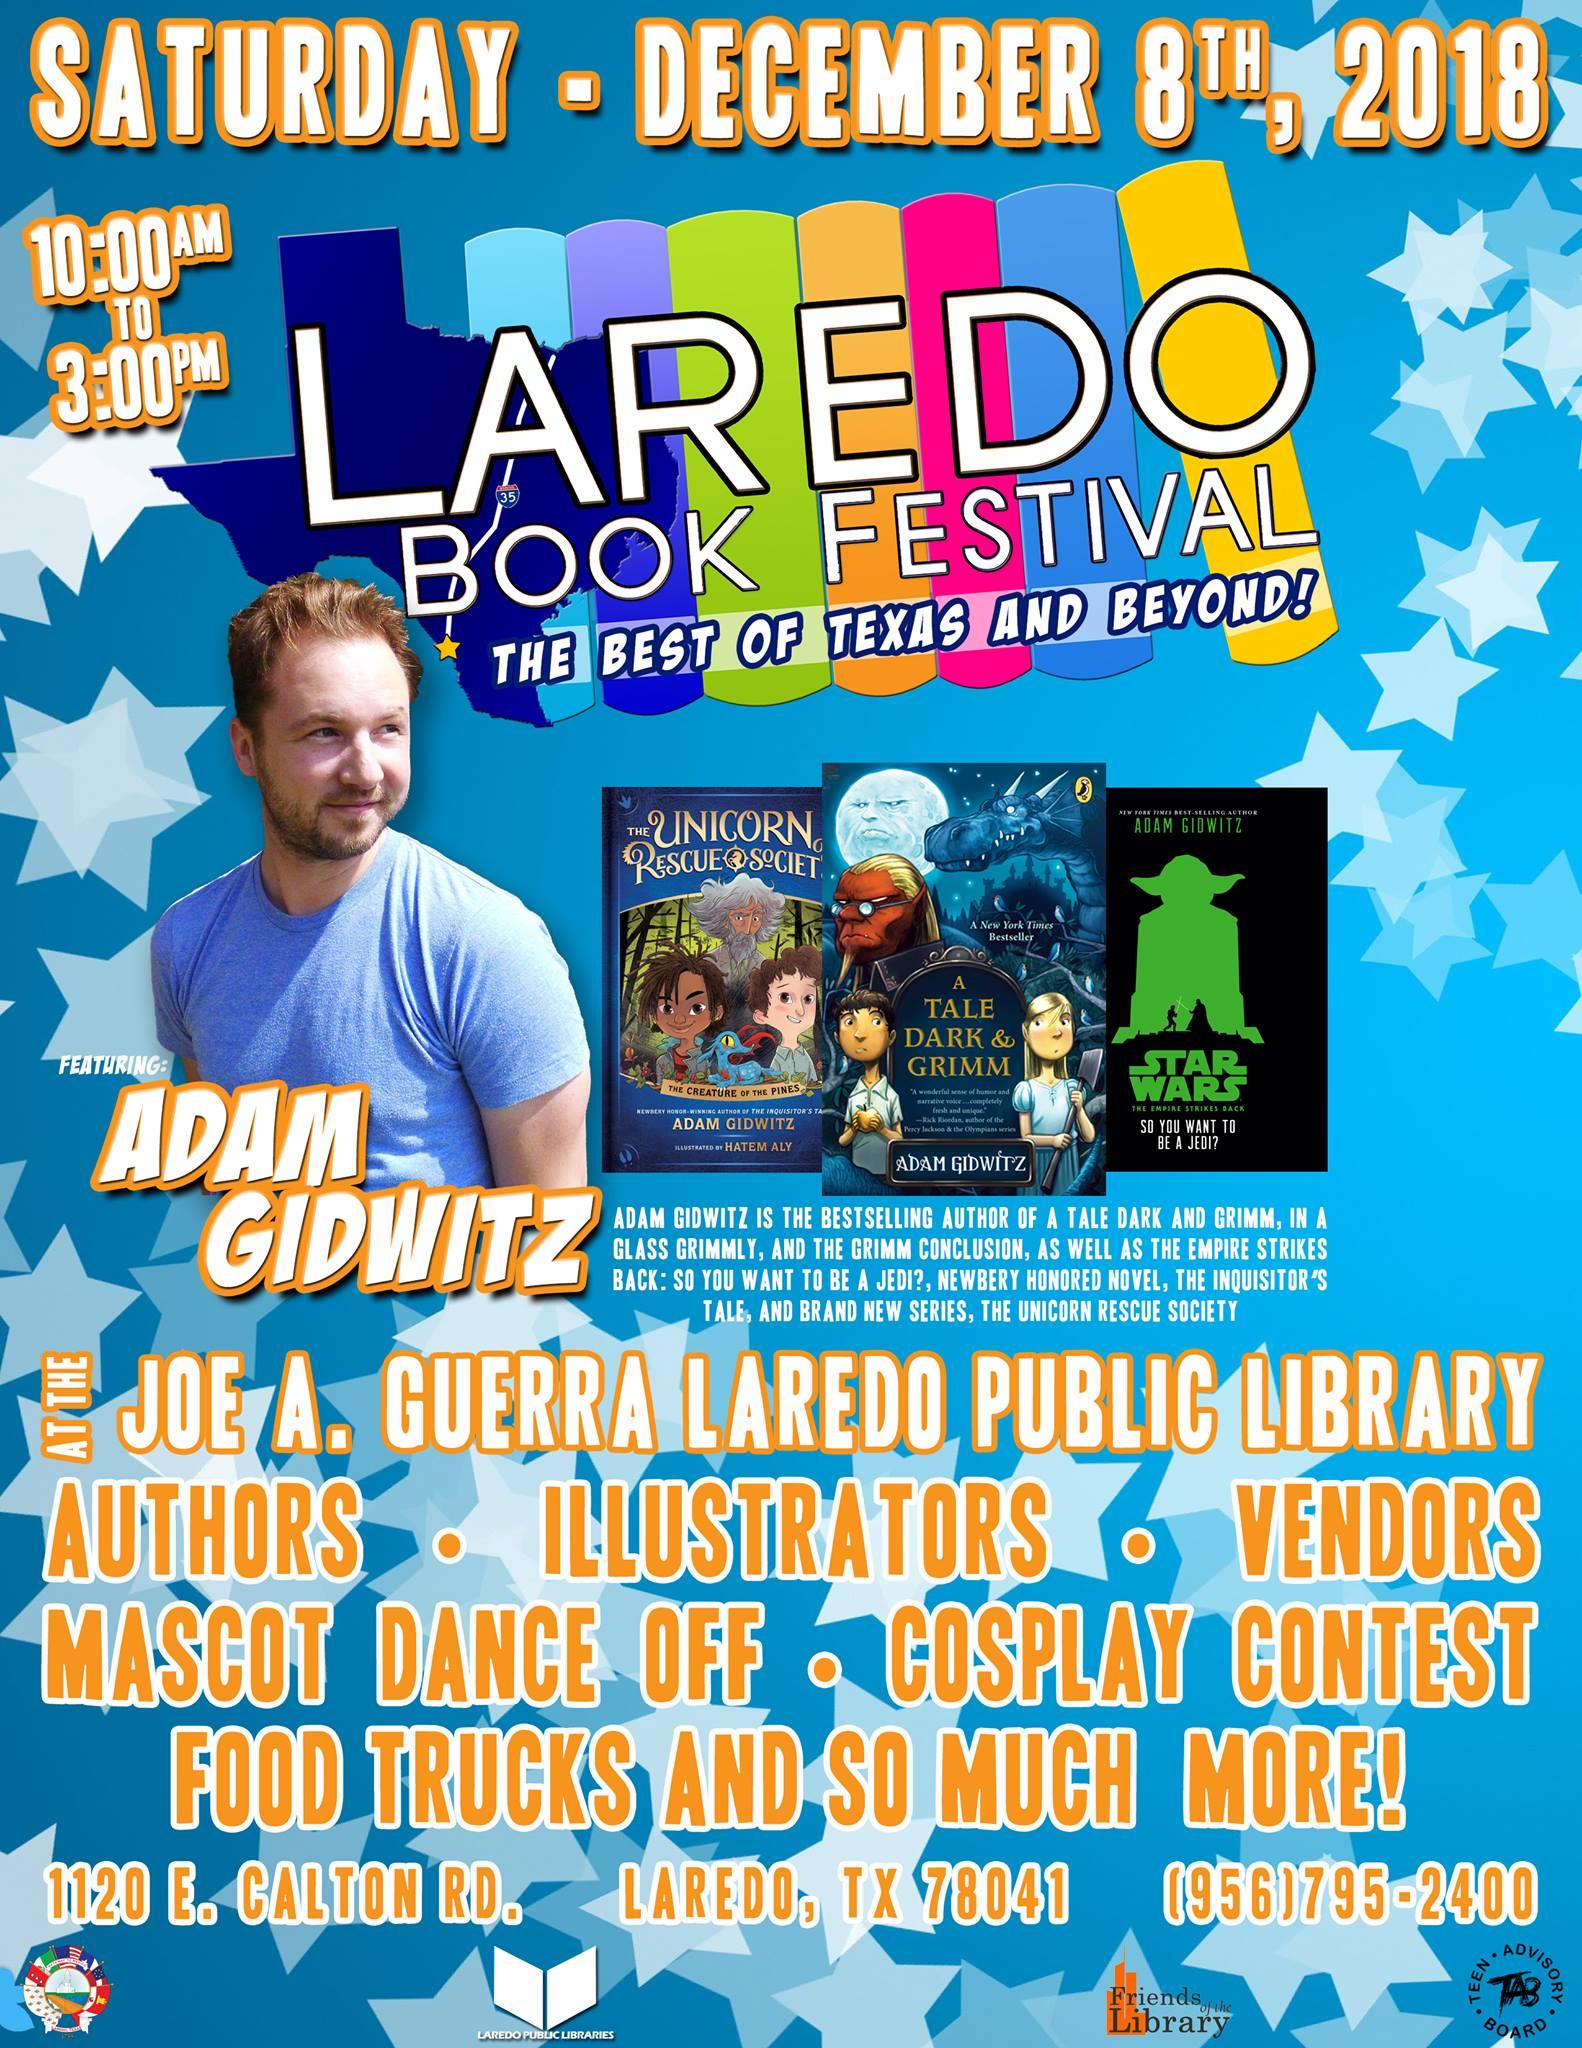 2018.12.08-LaredoBookFestival.jpg